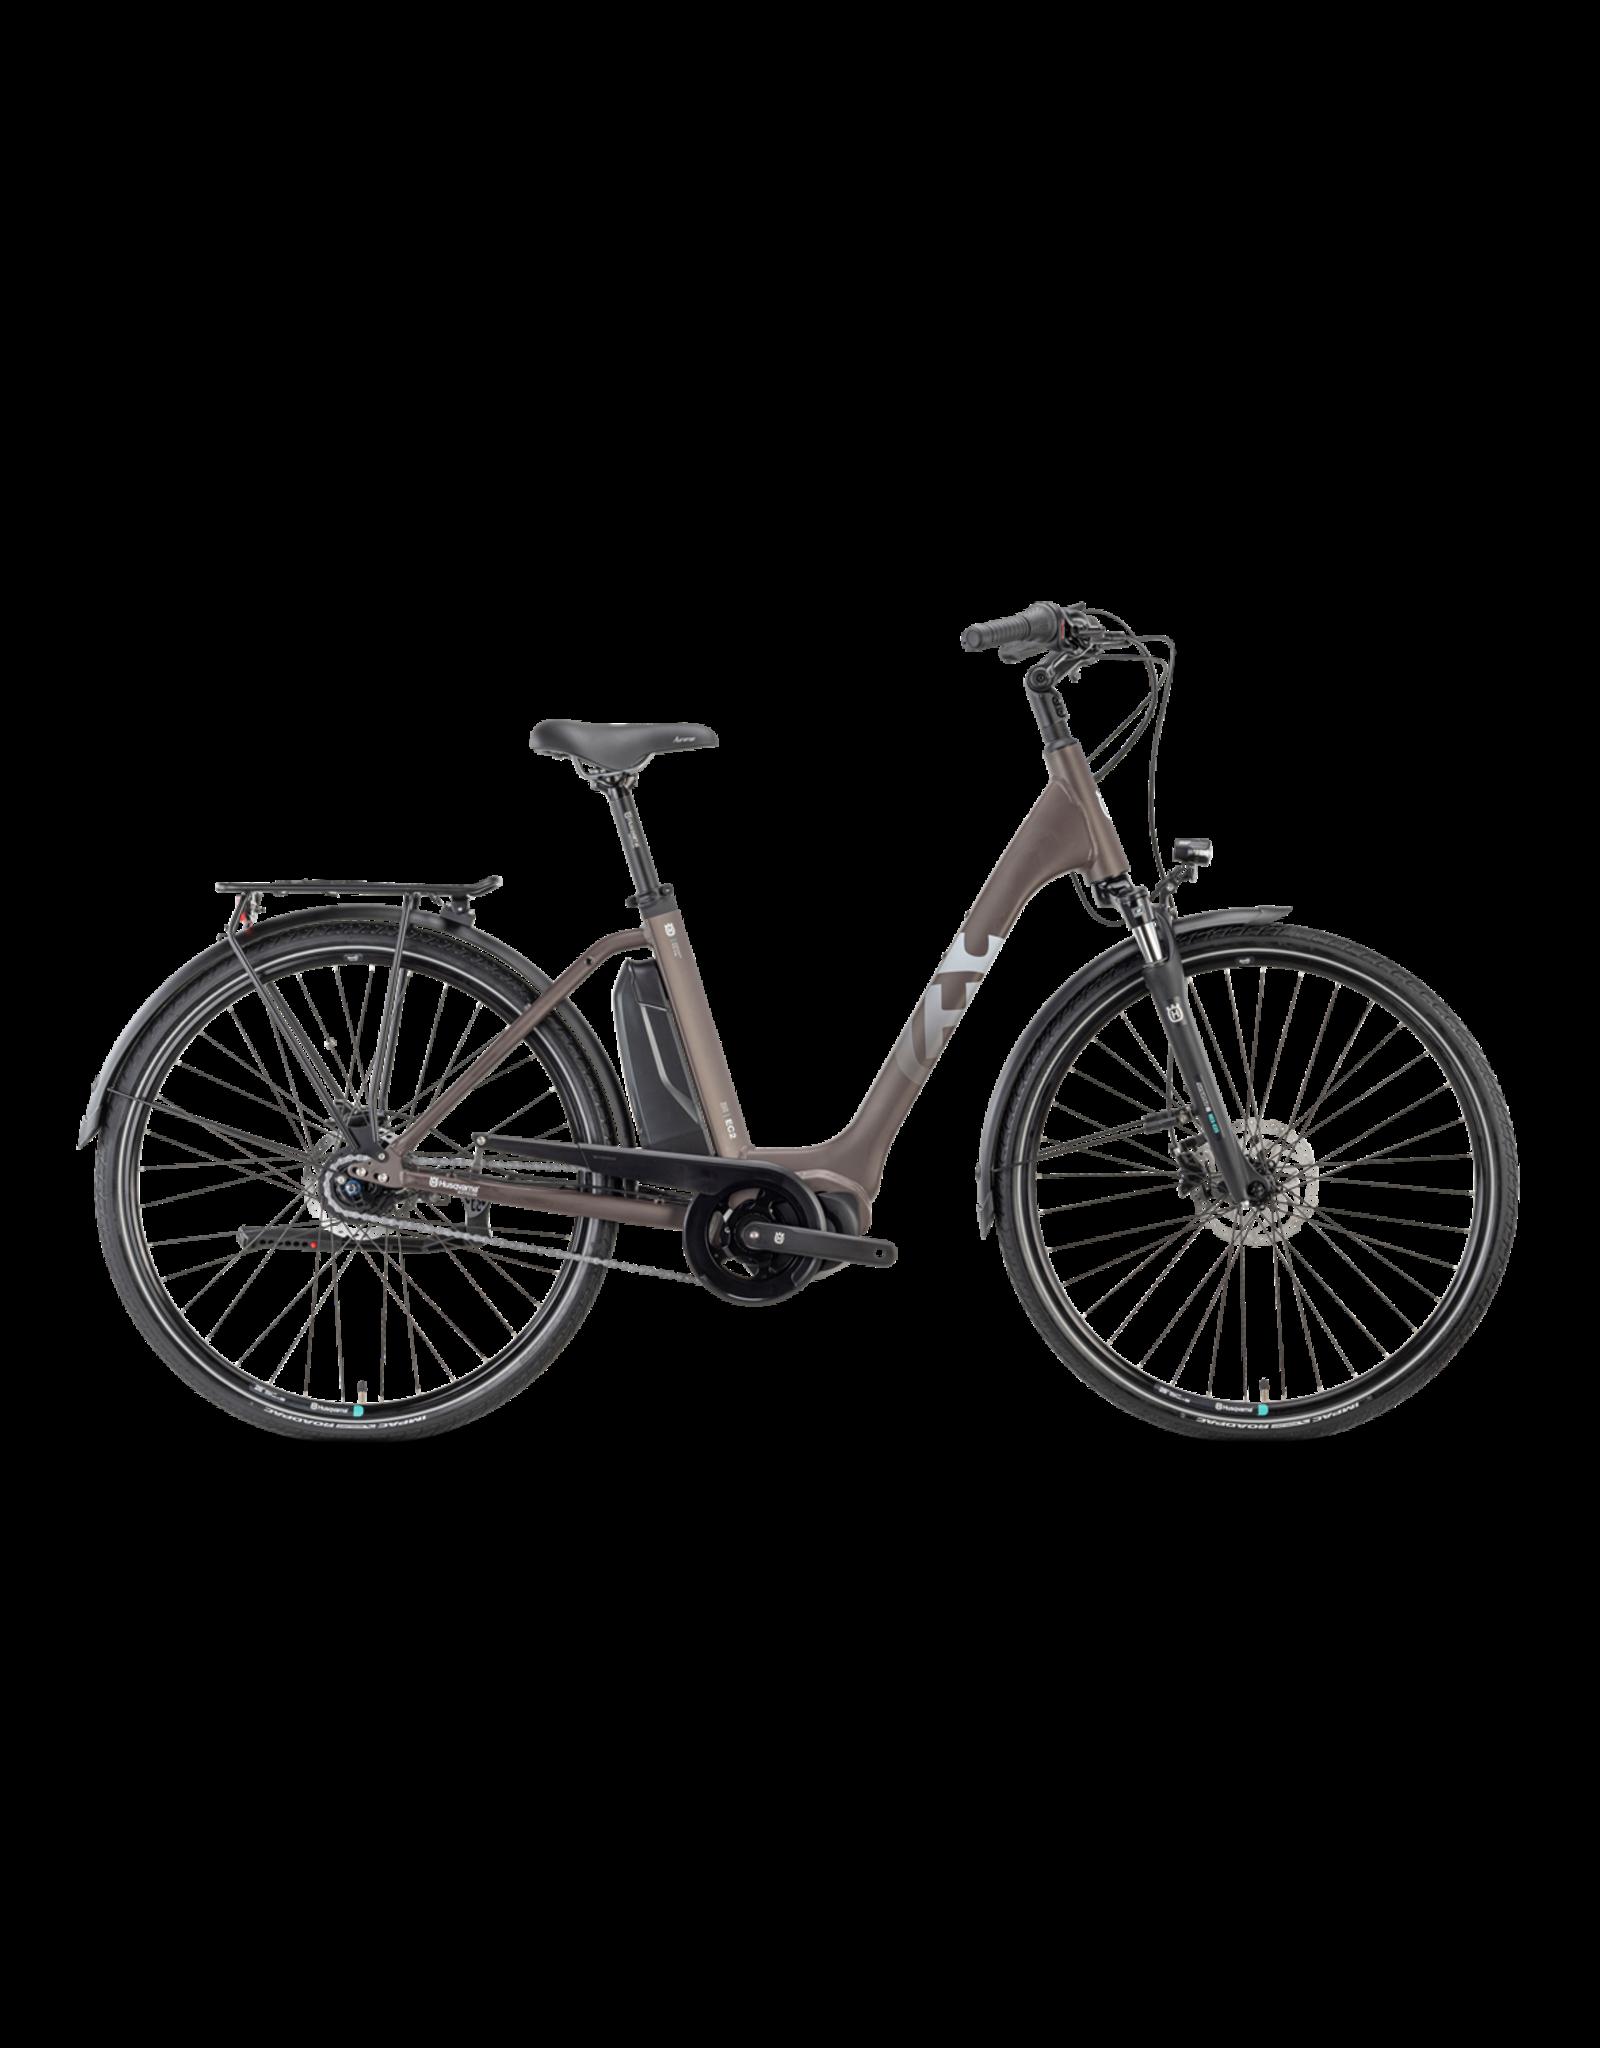 HUSQVARNA Bicycles Husqvarna Bicycles - Eco City EC2 CB 418 -  2021